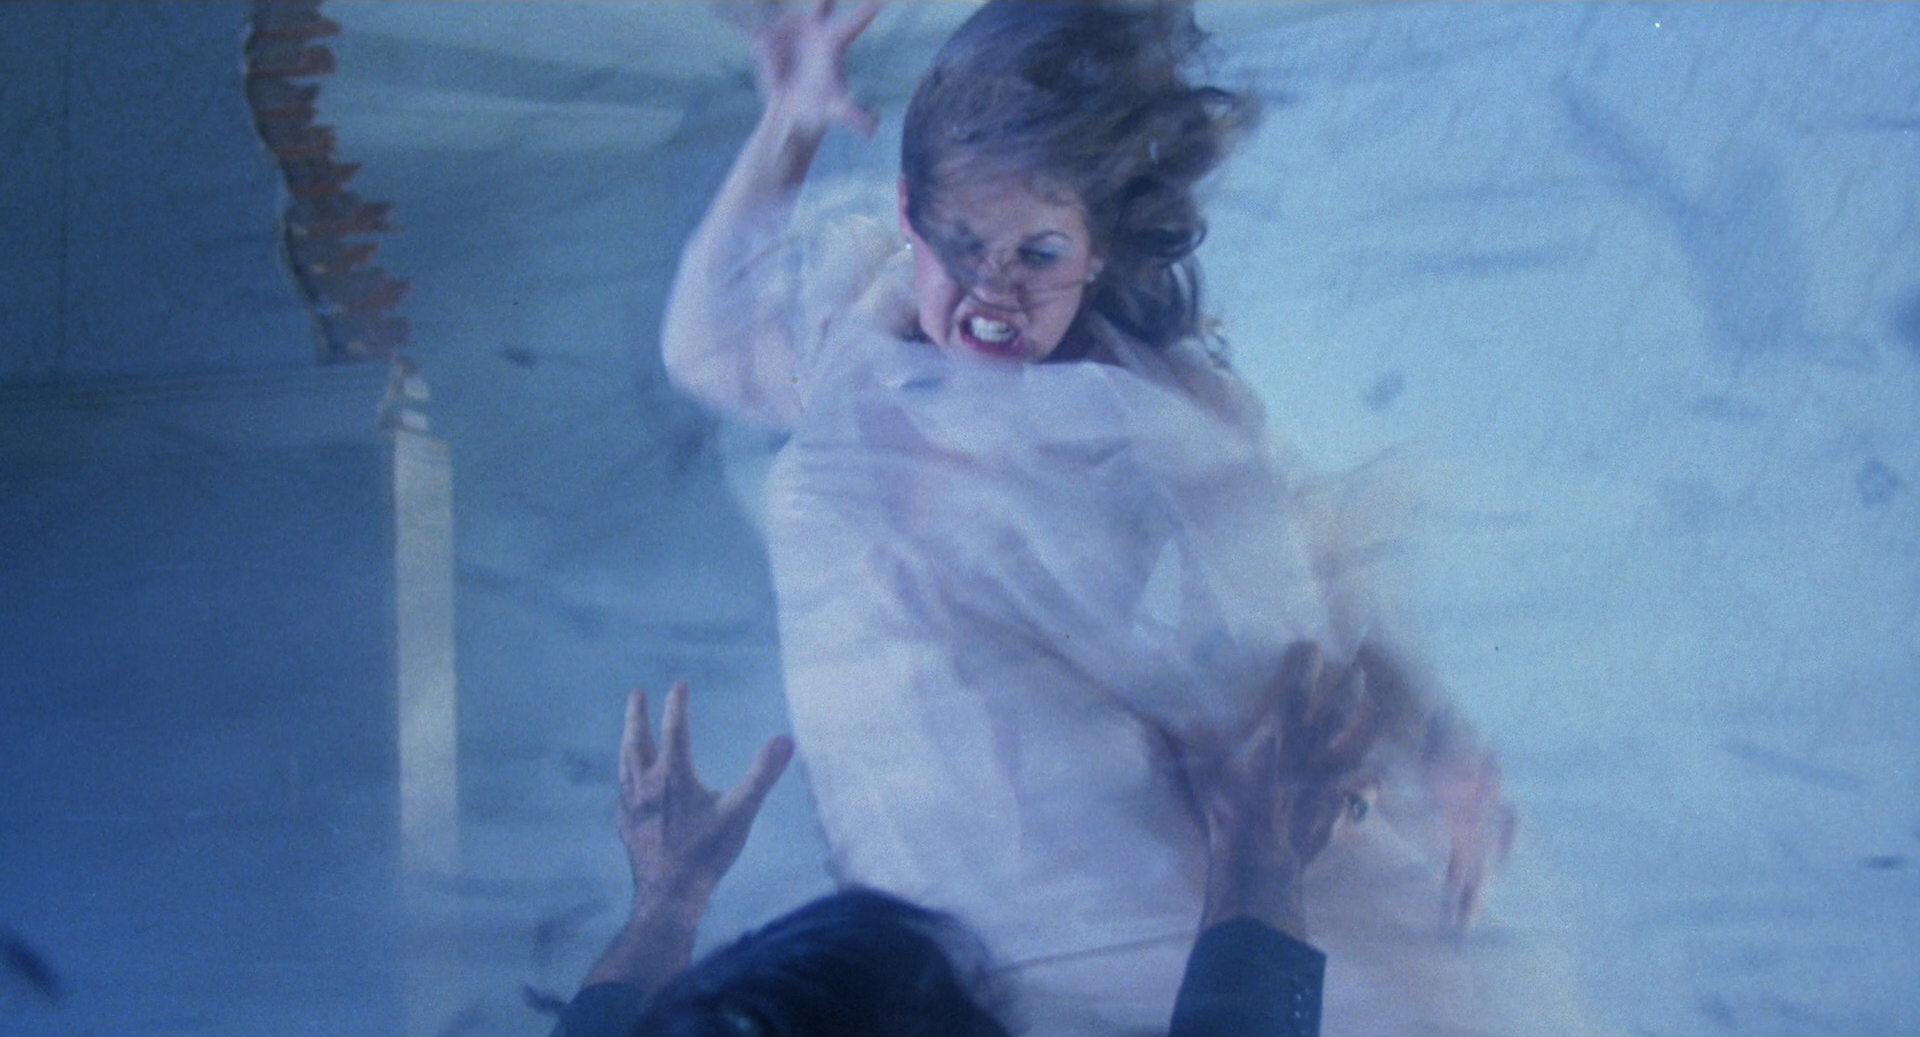 Exorcist II - Linda Blair Possessed Again